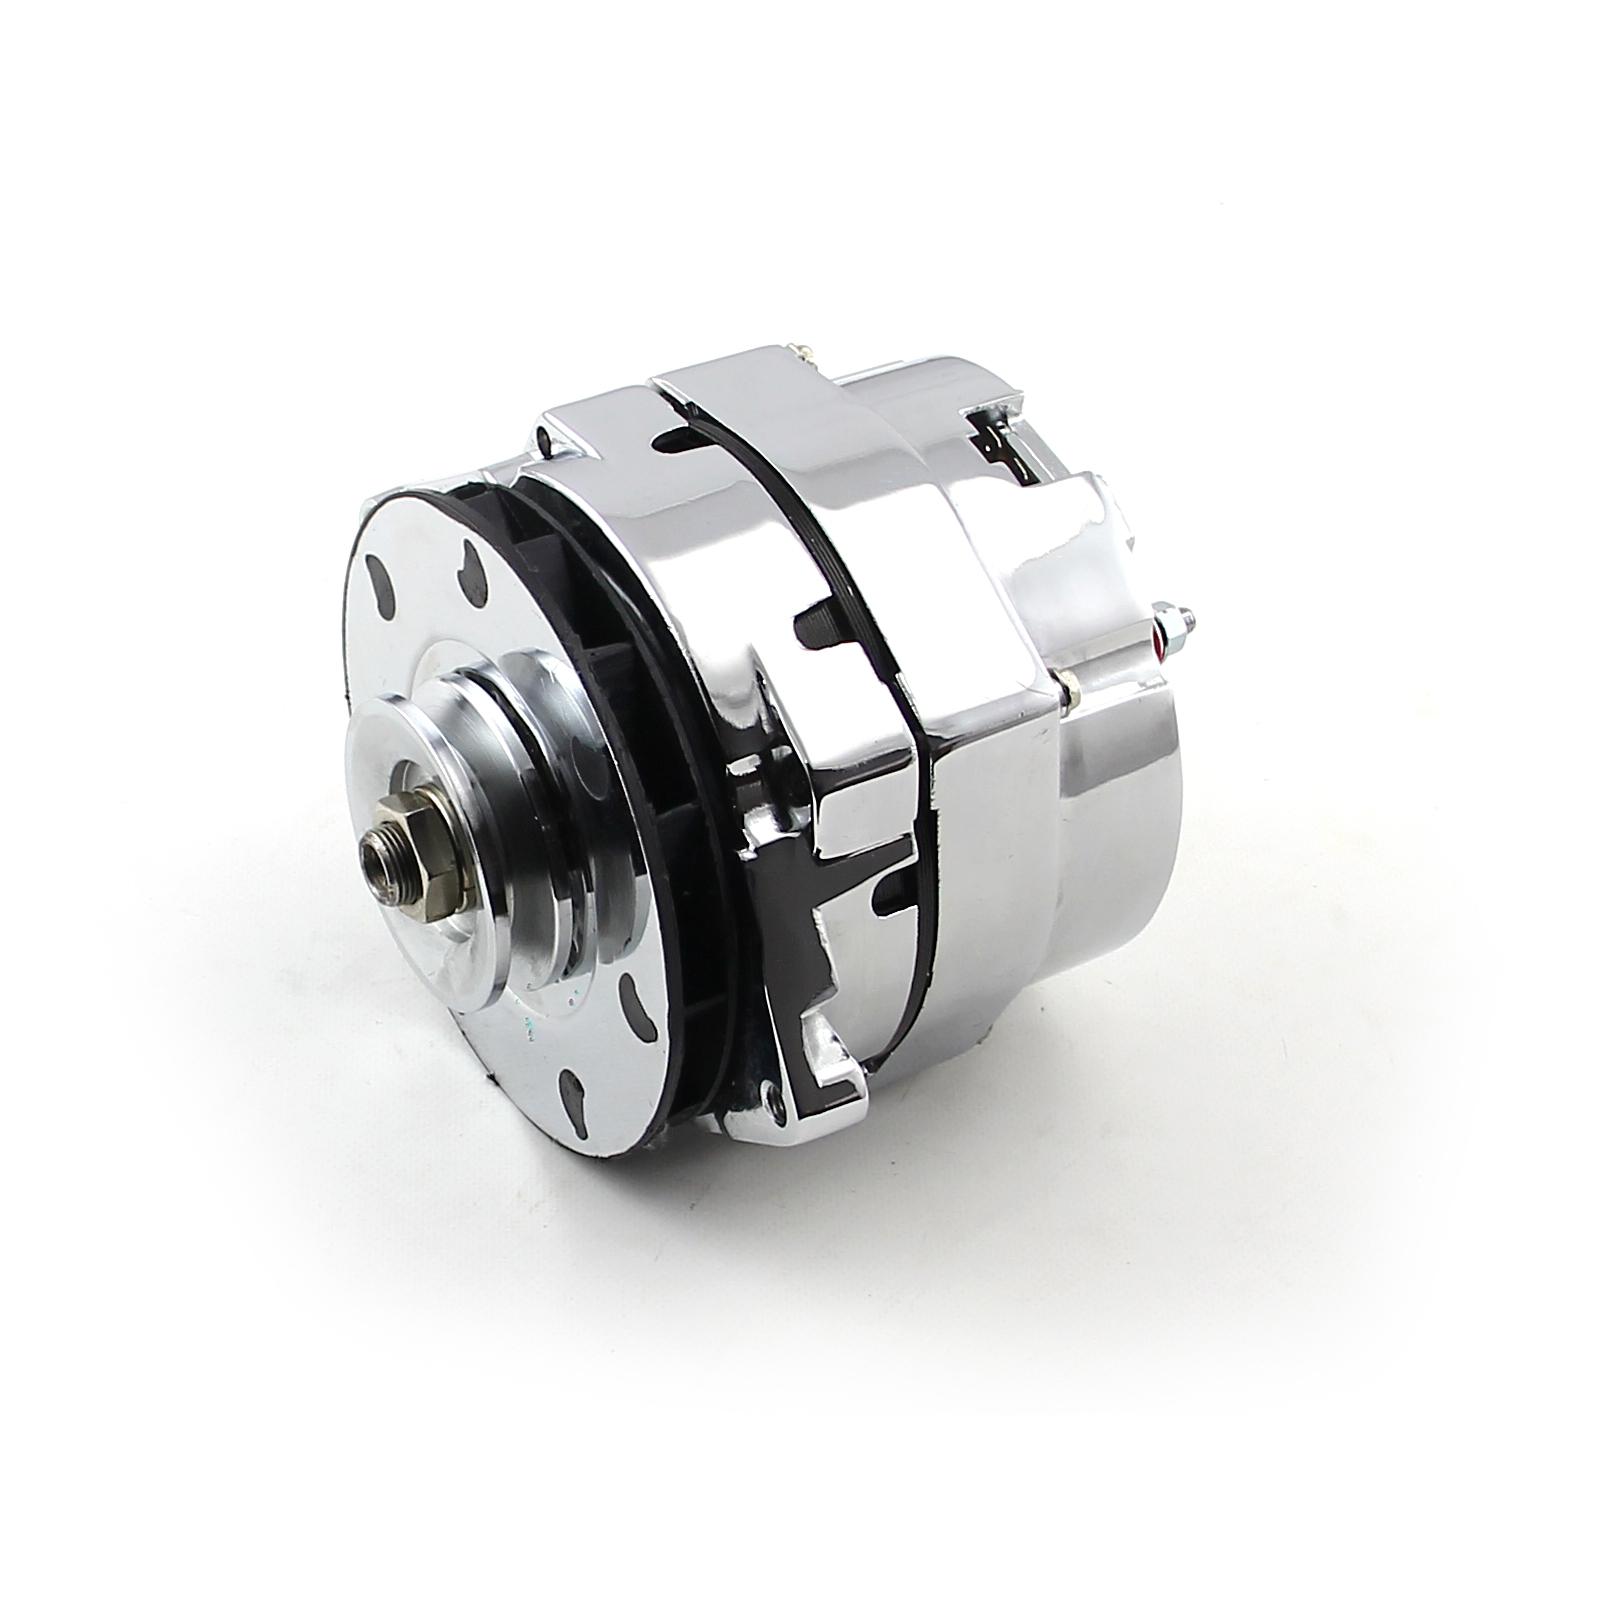 Universal Chrome 1 - 3 Wire 100-120 Amp High Output Alternator w/ Phenolic Fan